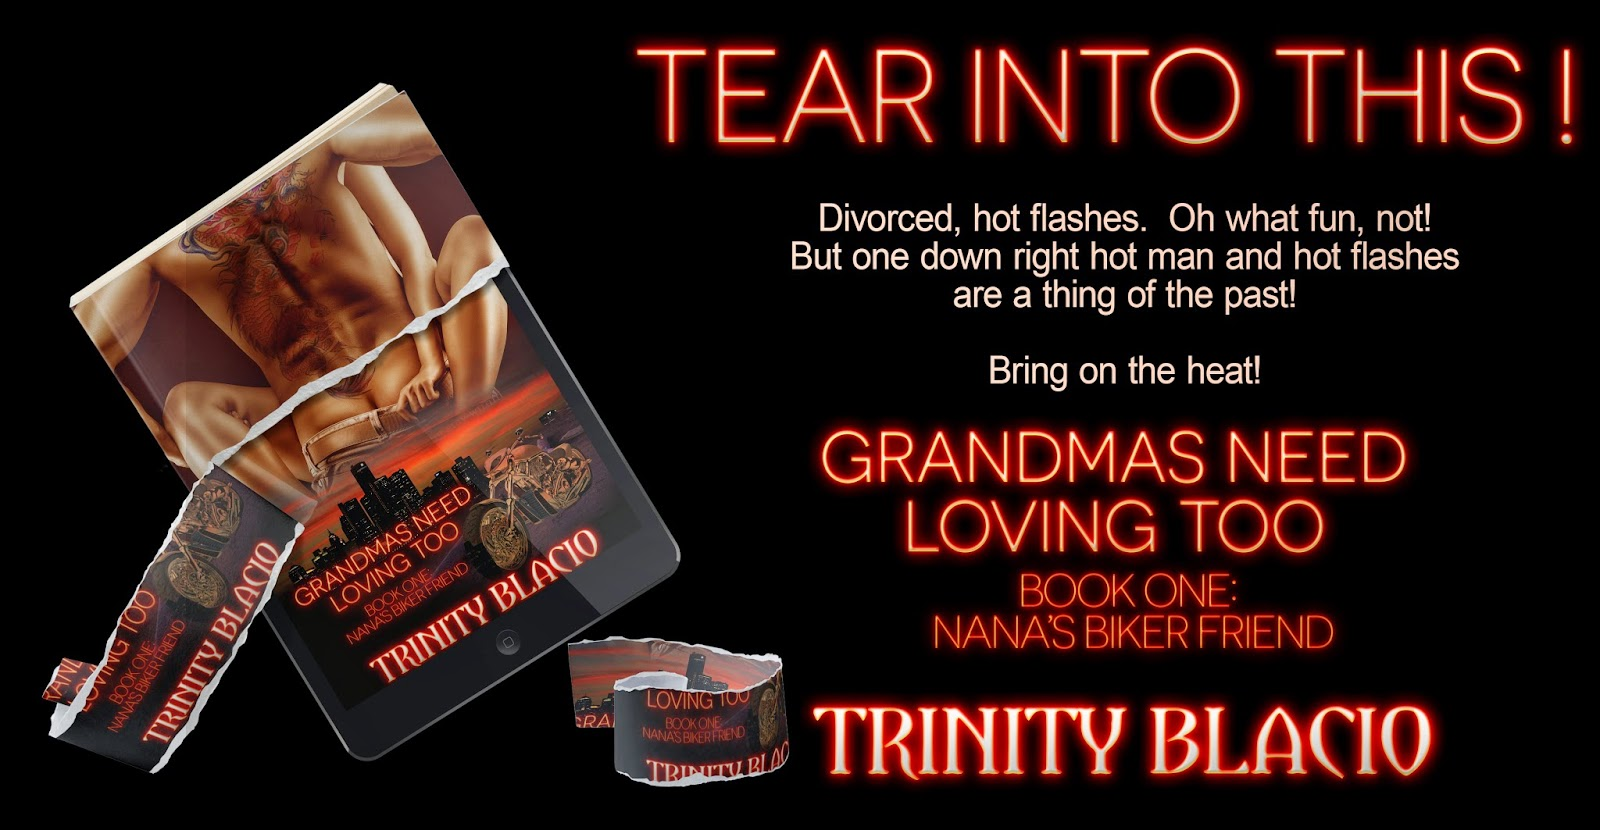 http://trinityblacio.com